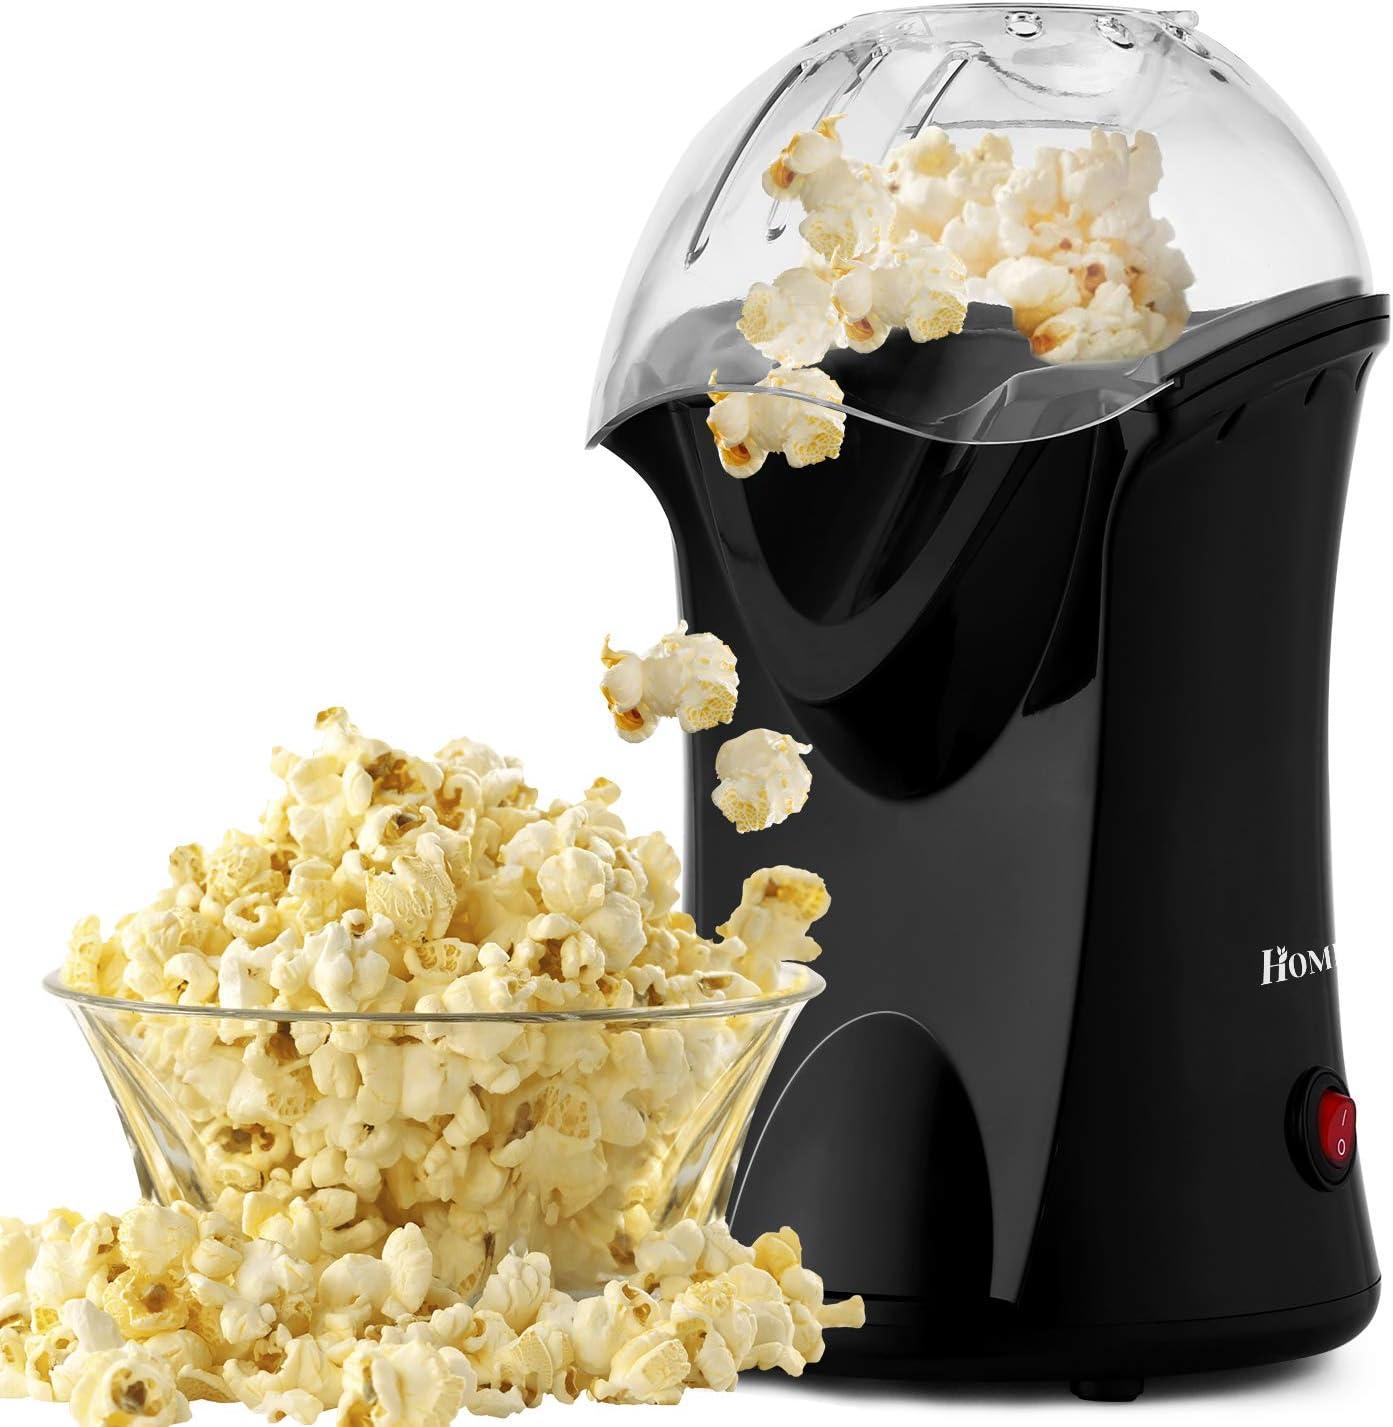 Black No Oil Popcorn Popper with Measuring Cup 1200W Hot Air Popcorn Popper Maker Popcorn Machine